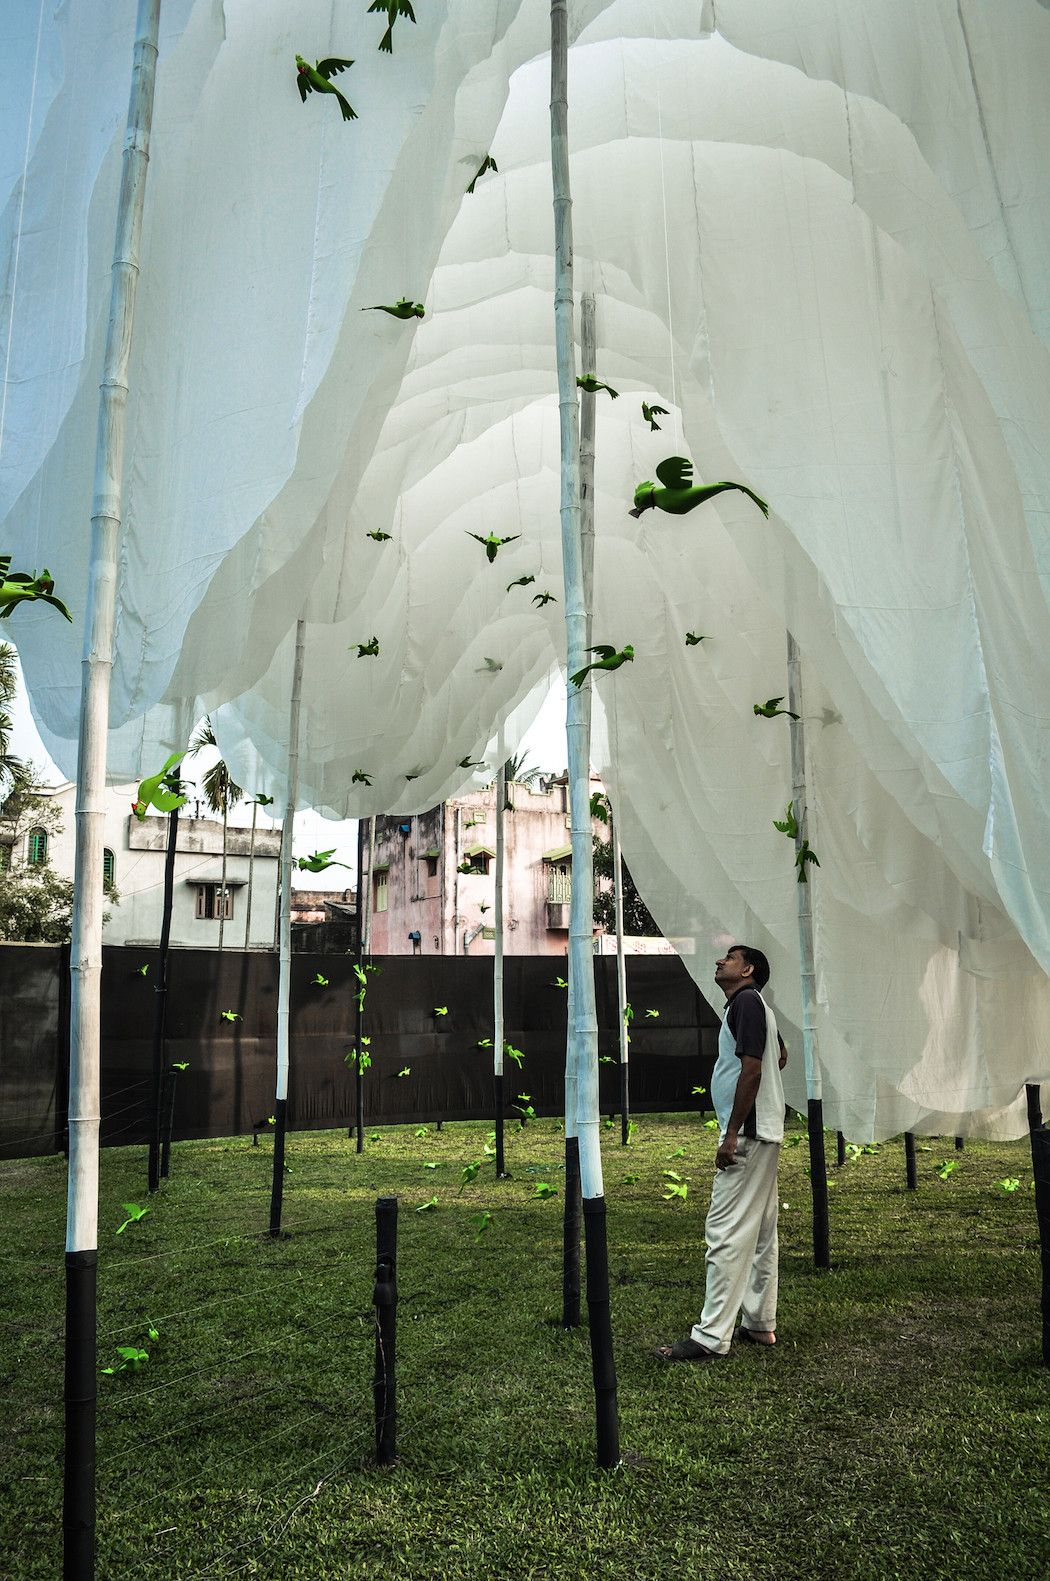 a pavilion of canopiesabin design studio | pavilion, canopy